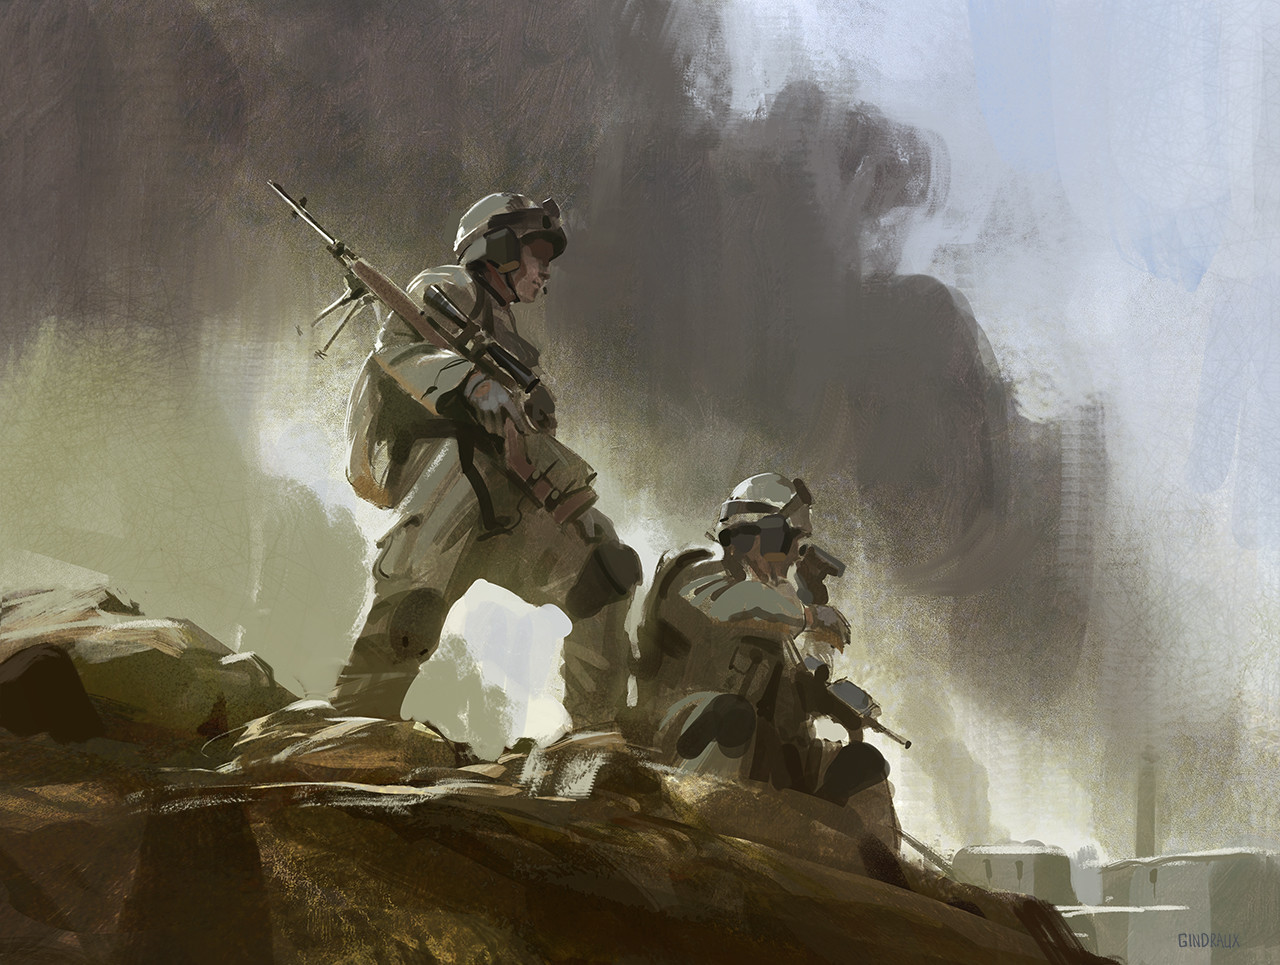 nick-gindraux-soldier-study3-artstation.jpg